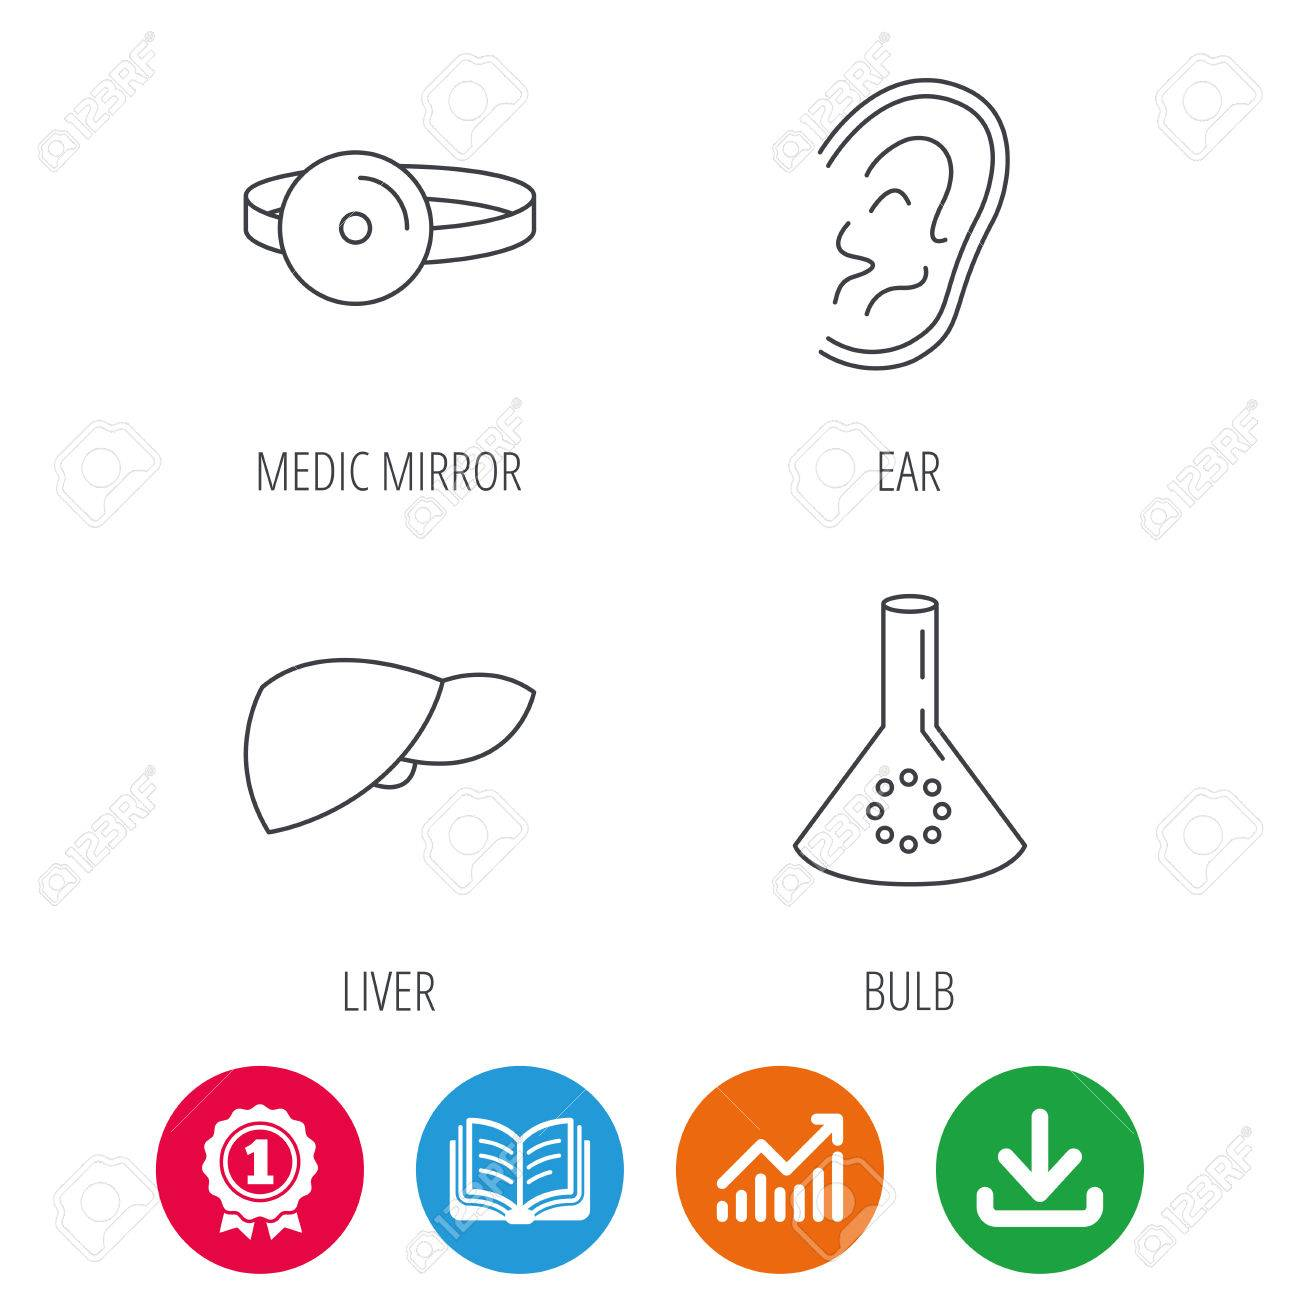 Tamagotchi angel growth chart image collections free any chart maltipoo growth chart image collections free any chart examples maltipoo growth chart choice image free any nvjuhfo Images